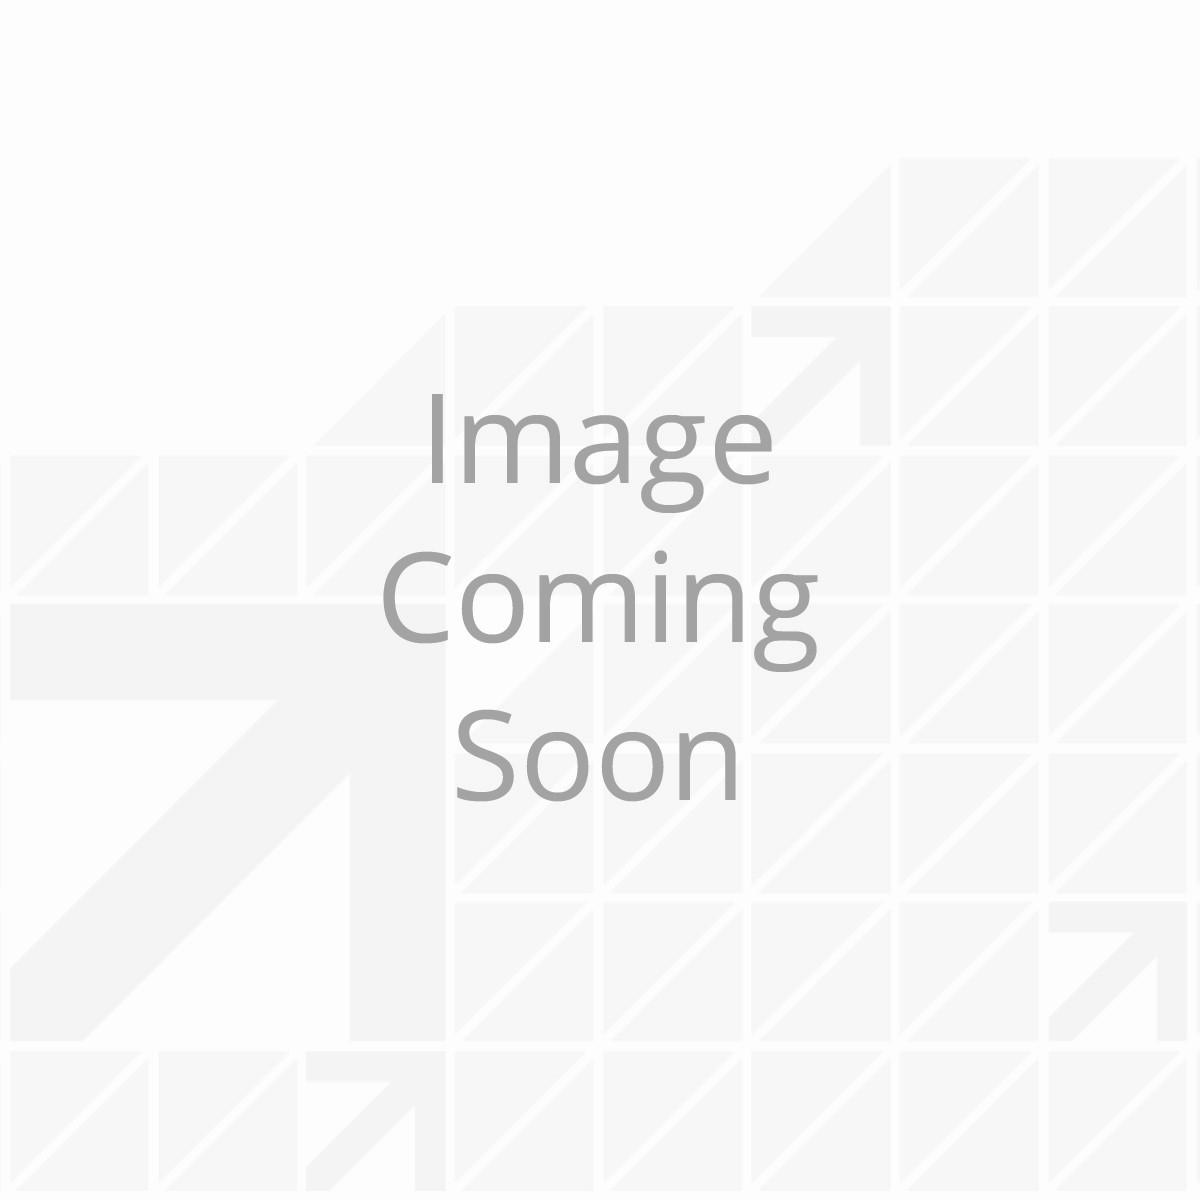 122076_Cone-Nut_001